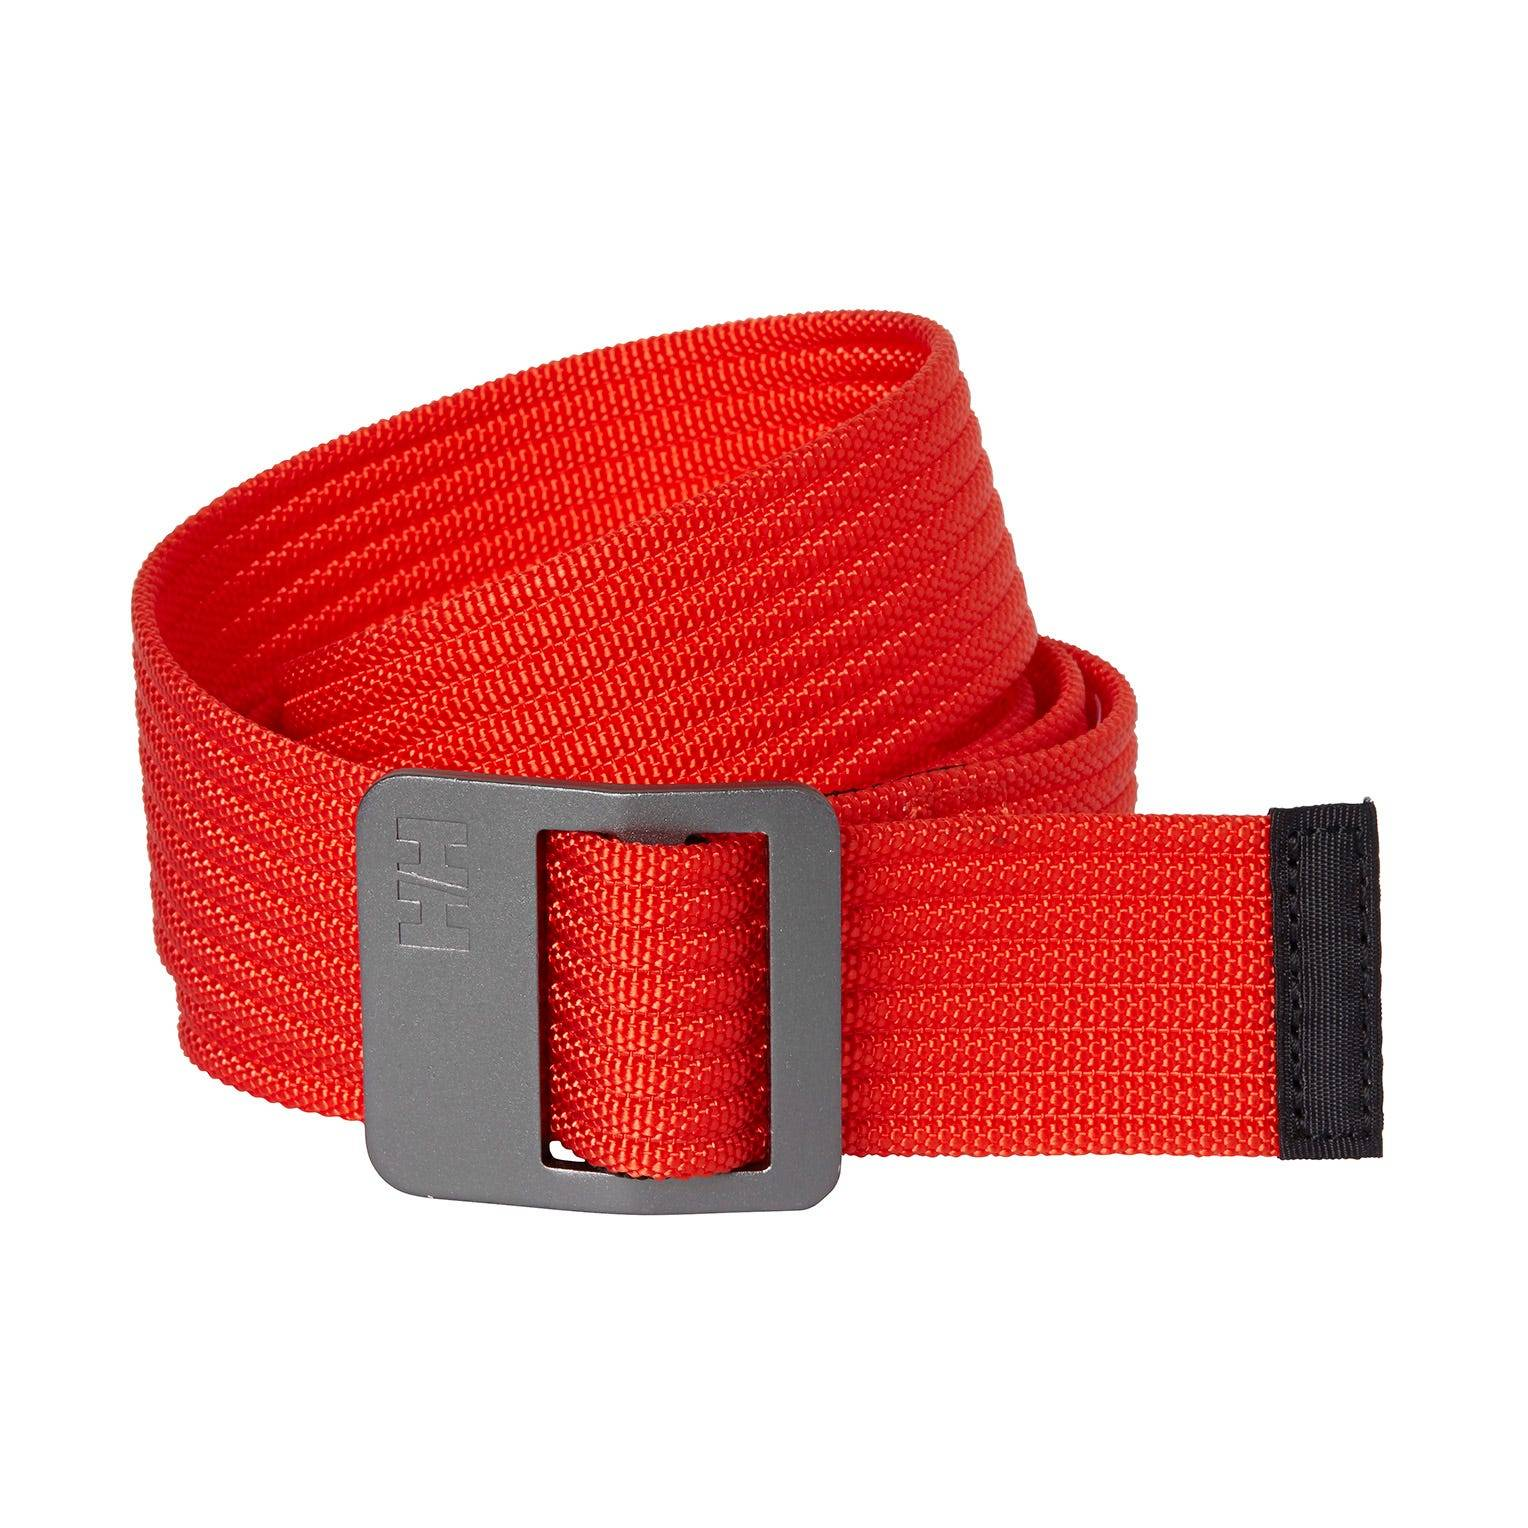 Helly Hansen Webbing Belt Red 140